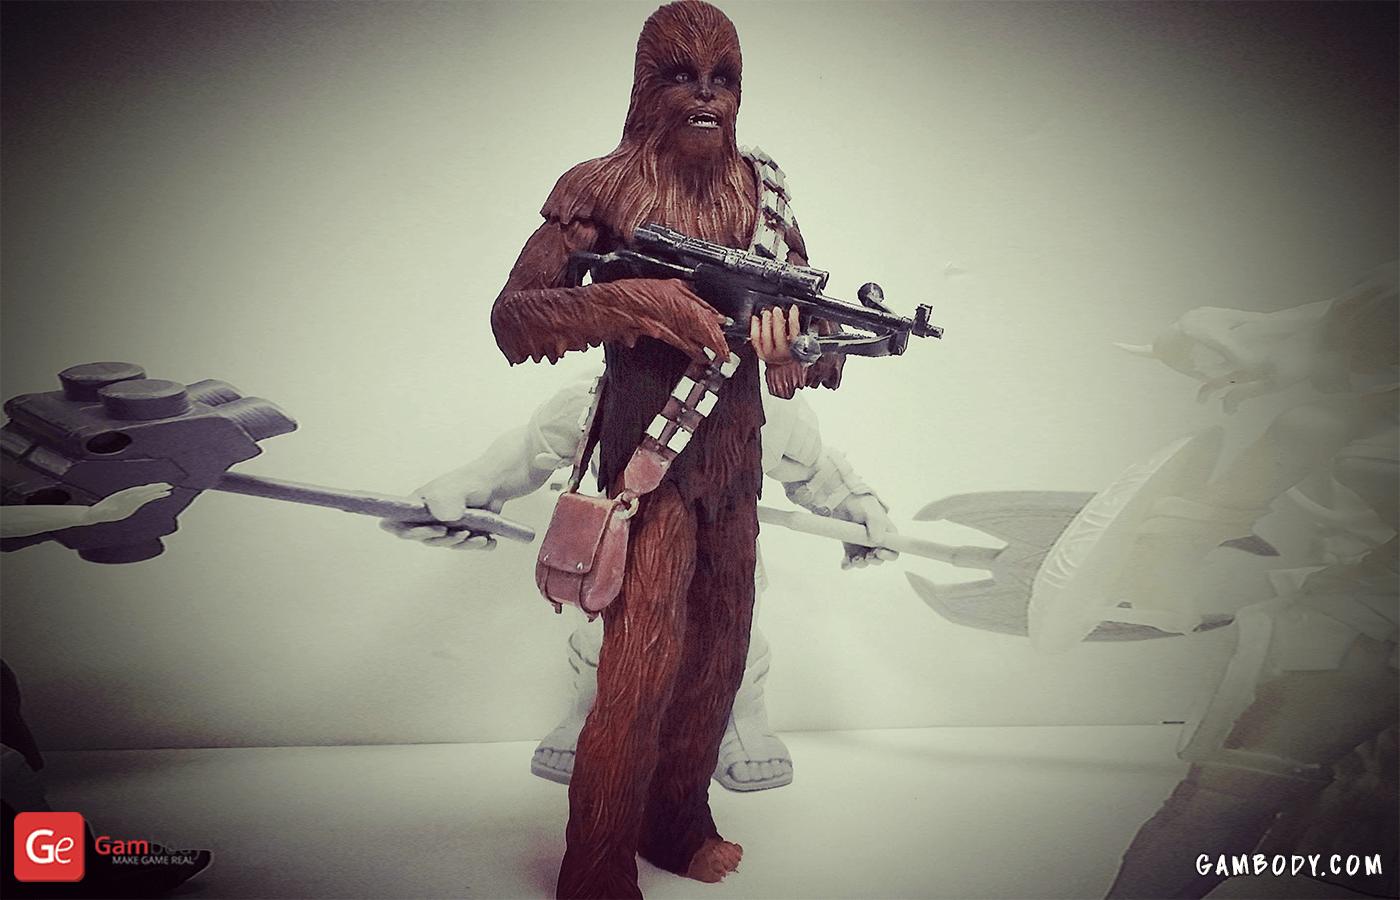 Chewbacca 3D Printing Figurine